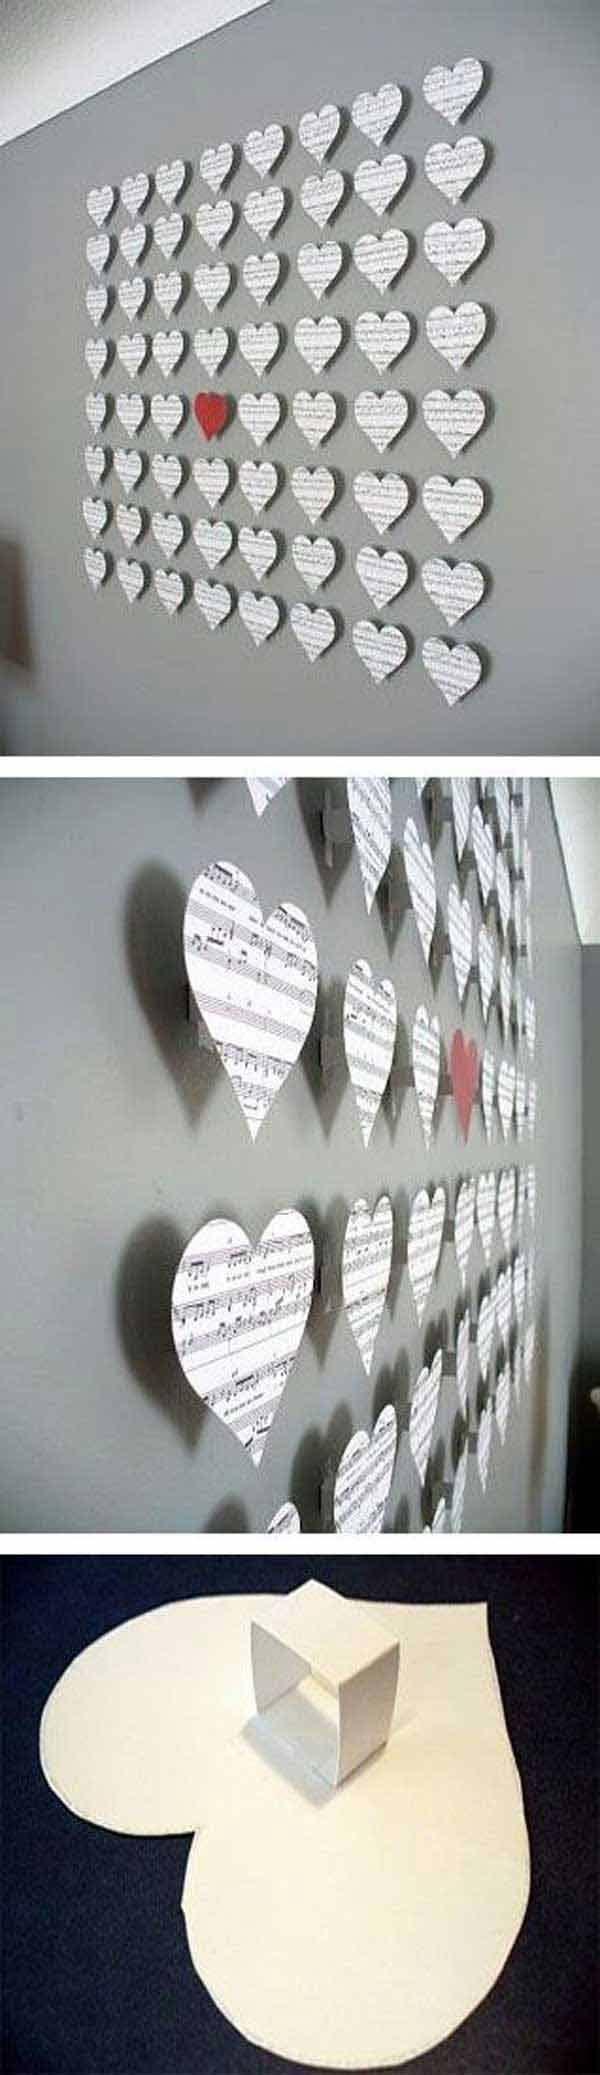 ValentinesDayCrafts-29